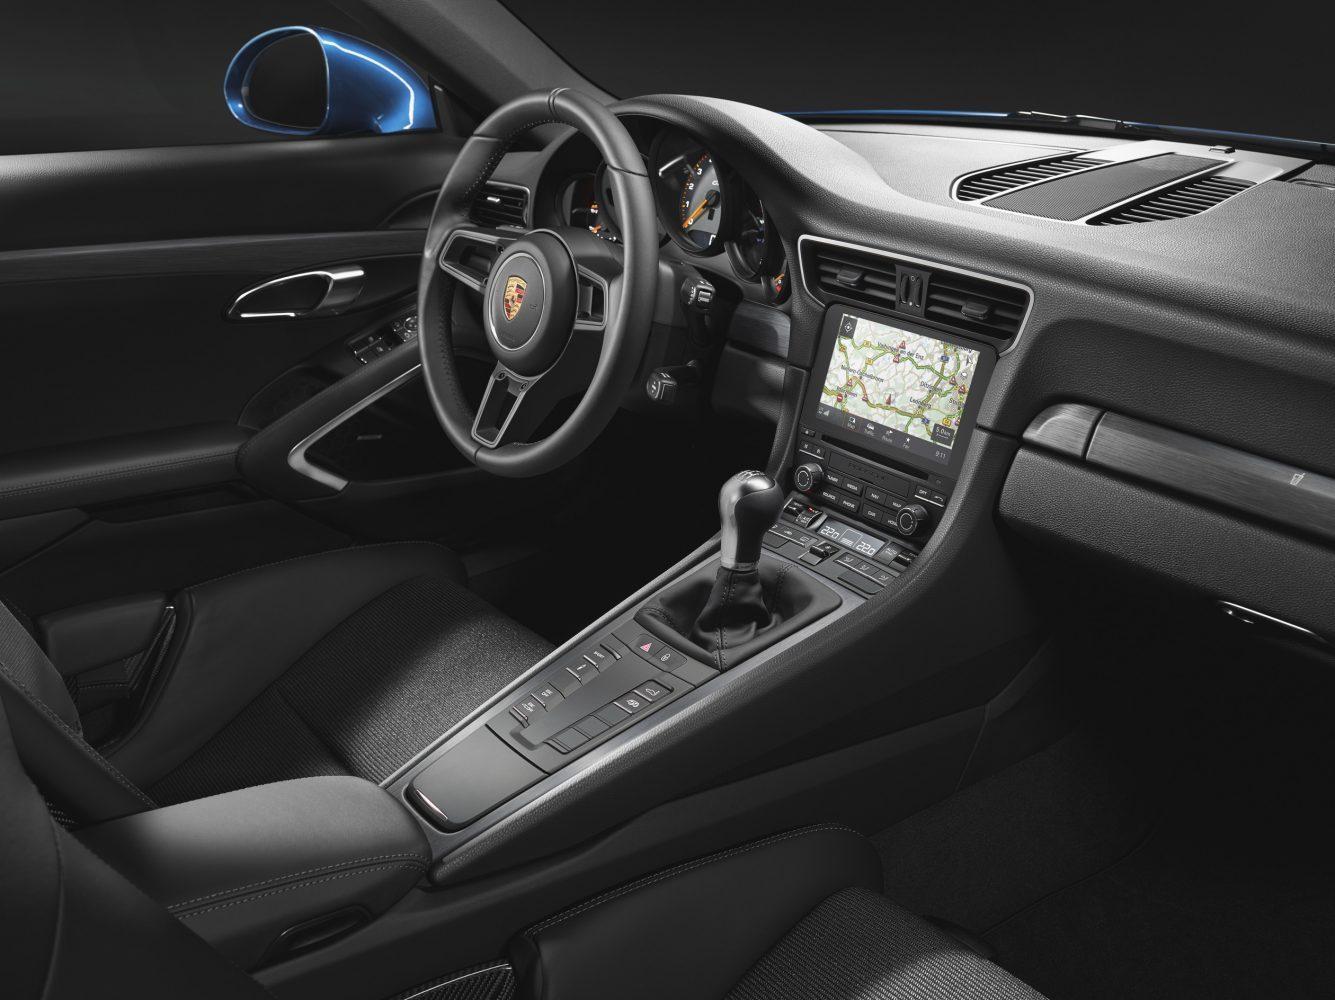 Klassischer Innenraum - Porsche 911 GT3 Touring Package (991.2) (Foto: Porsche)